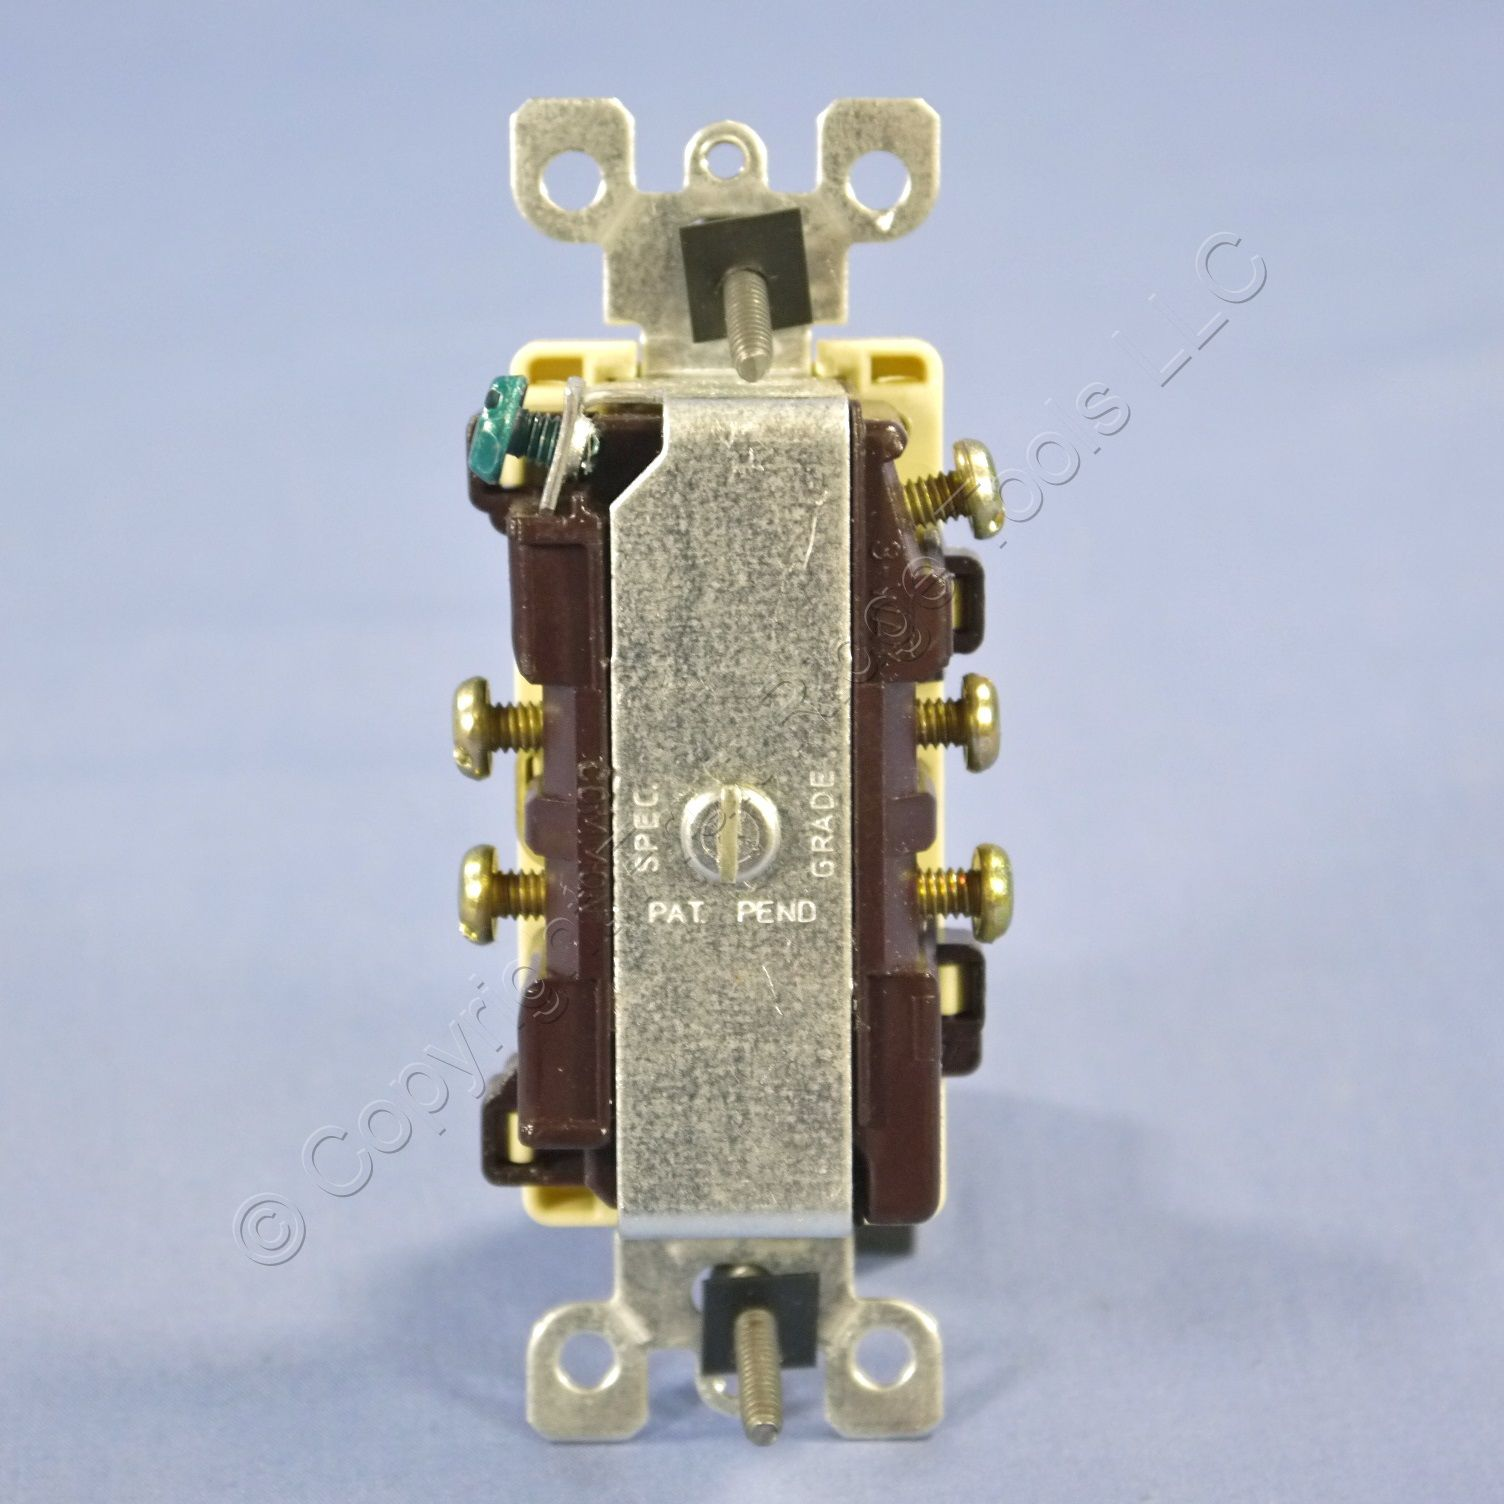 leviton 15 amp combination double switch wiring diagram wiring leviton 5641 double switch wiring diagram fan light